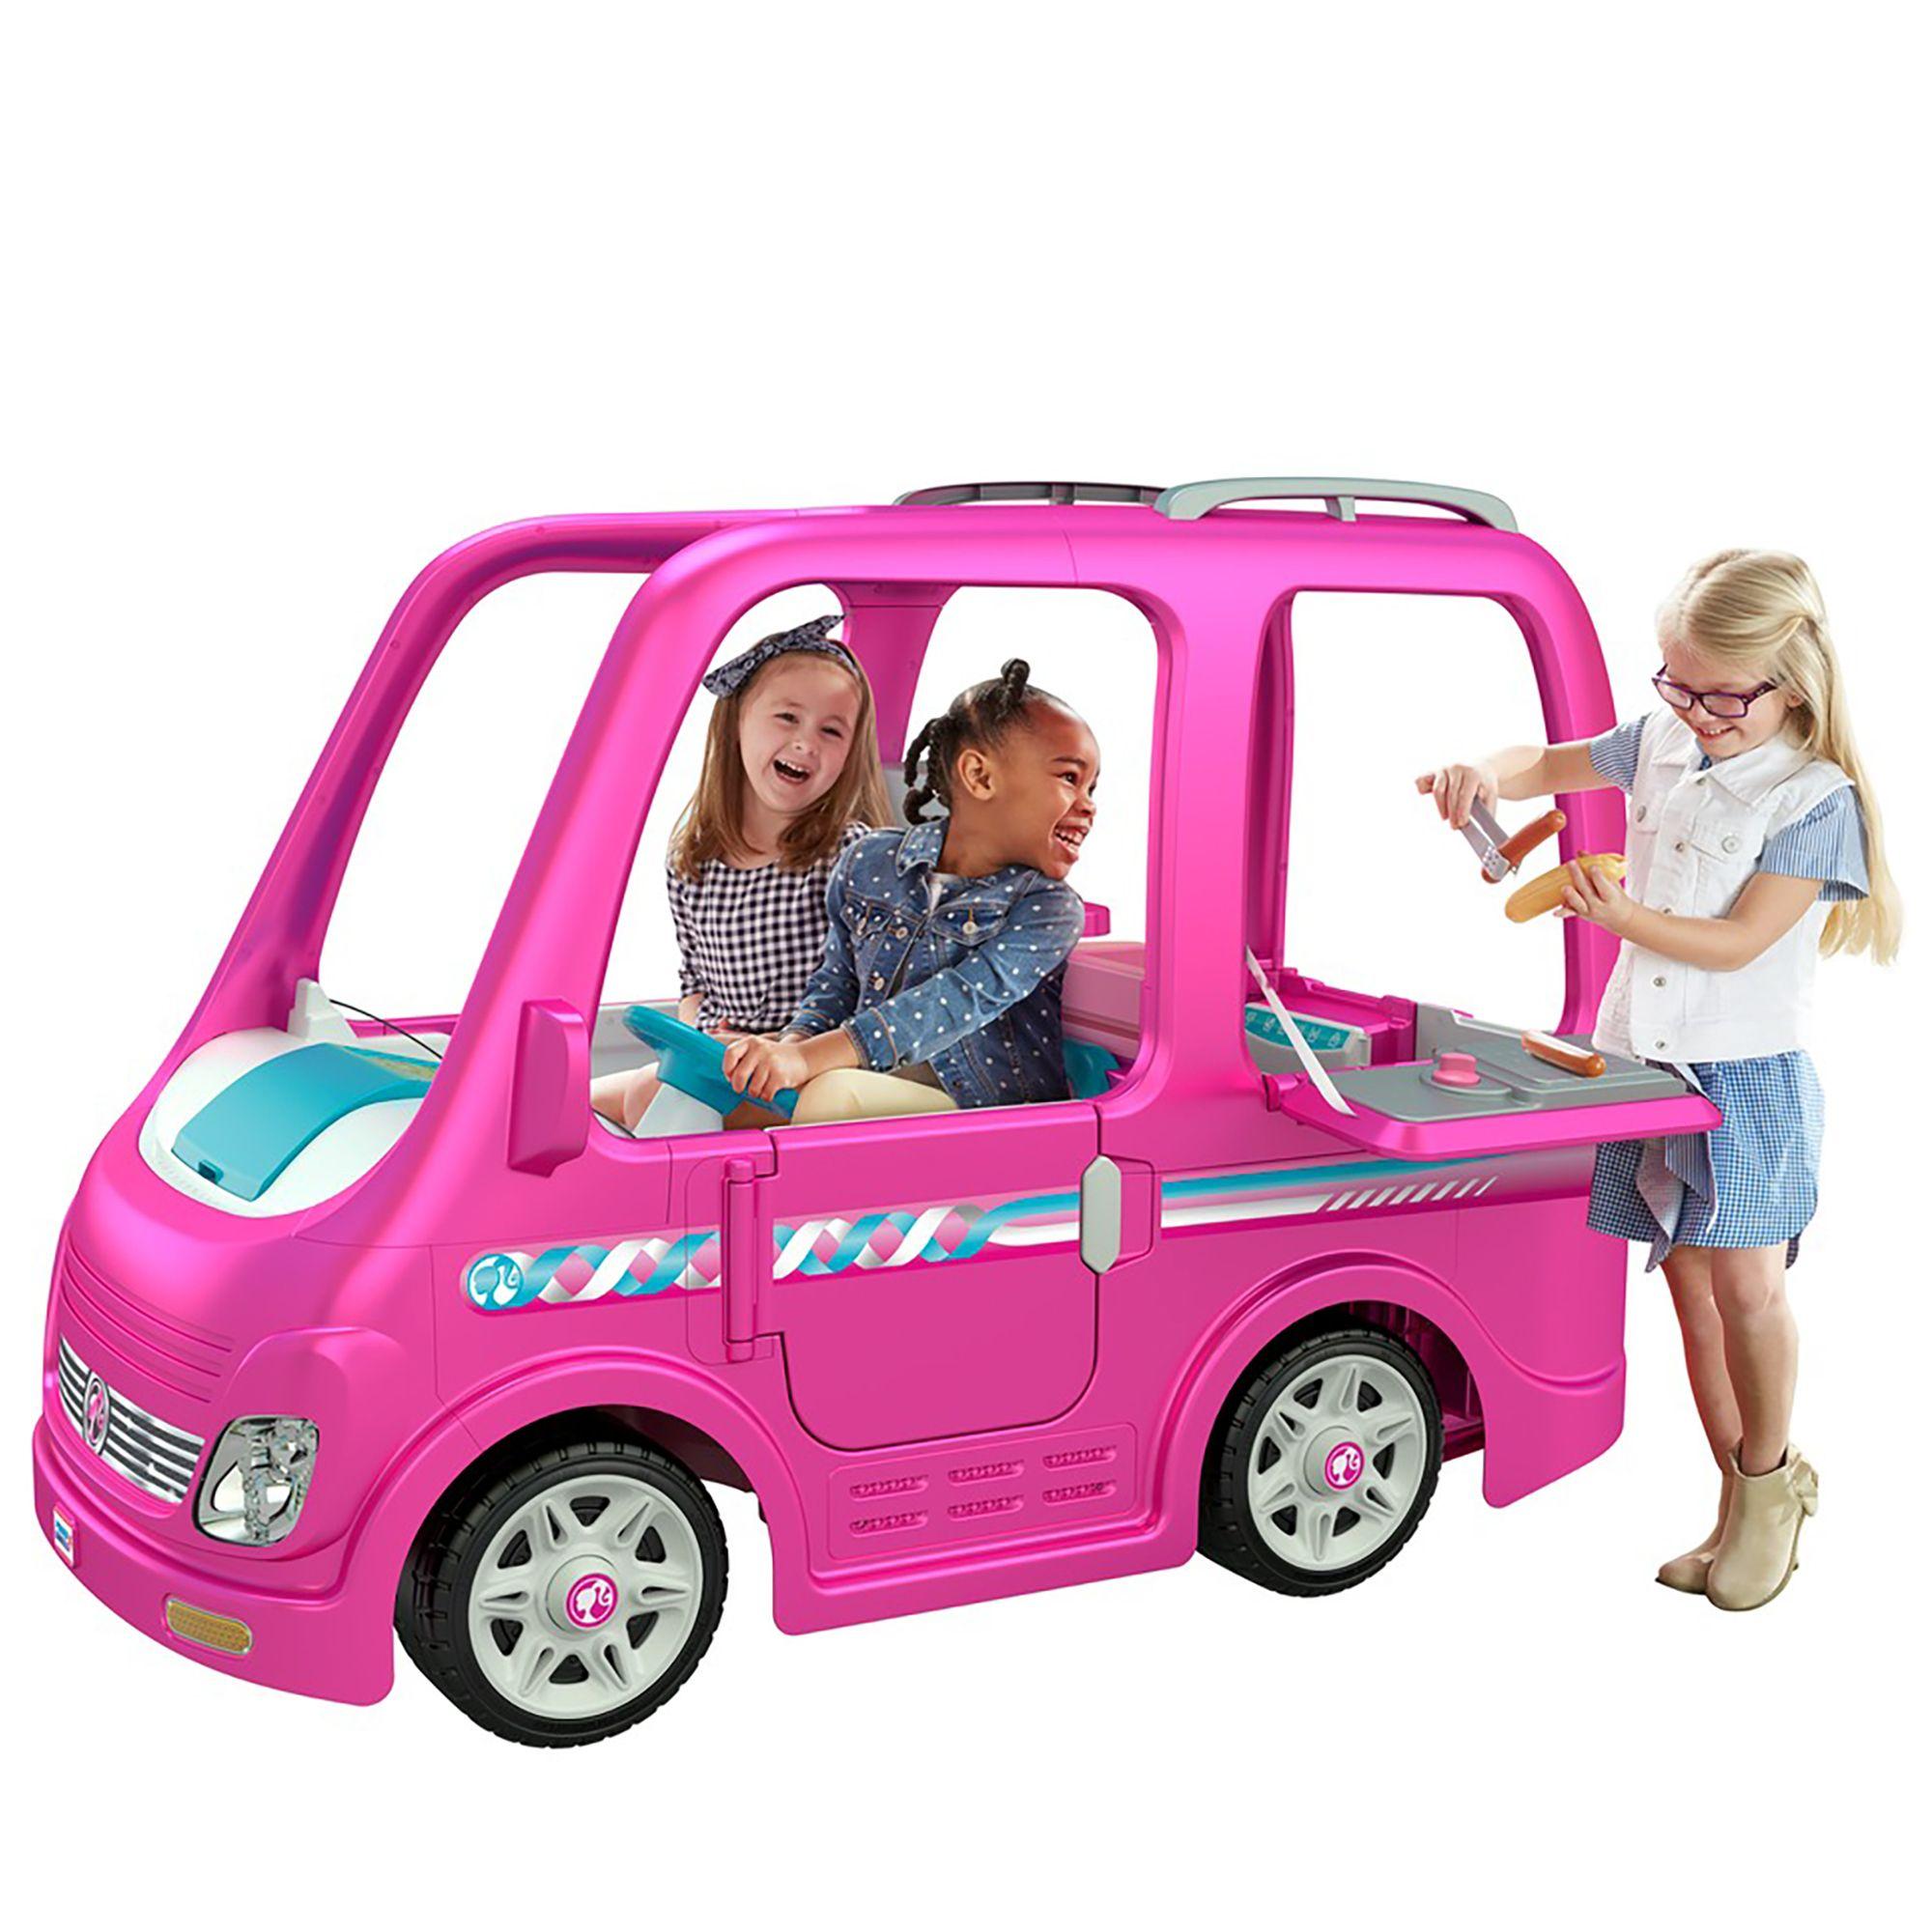 Power Wheels Barbie Dream Camper Battery Powered Ride On Vehicle Walmart Com In 2020 Barbie Car Barbie Camper Power Wheels